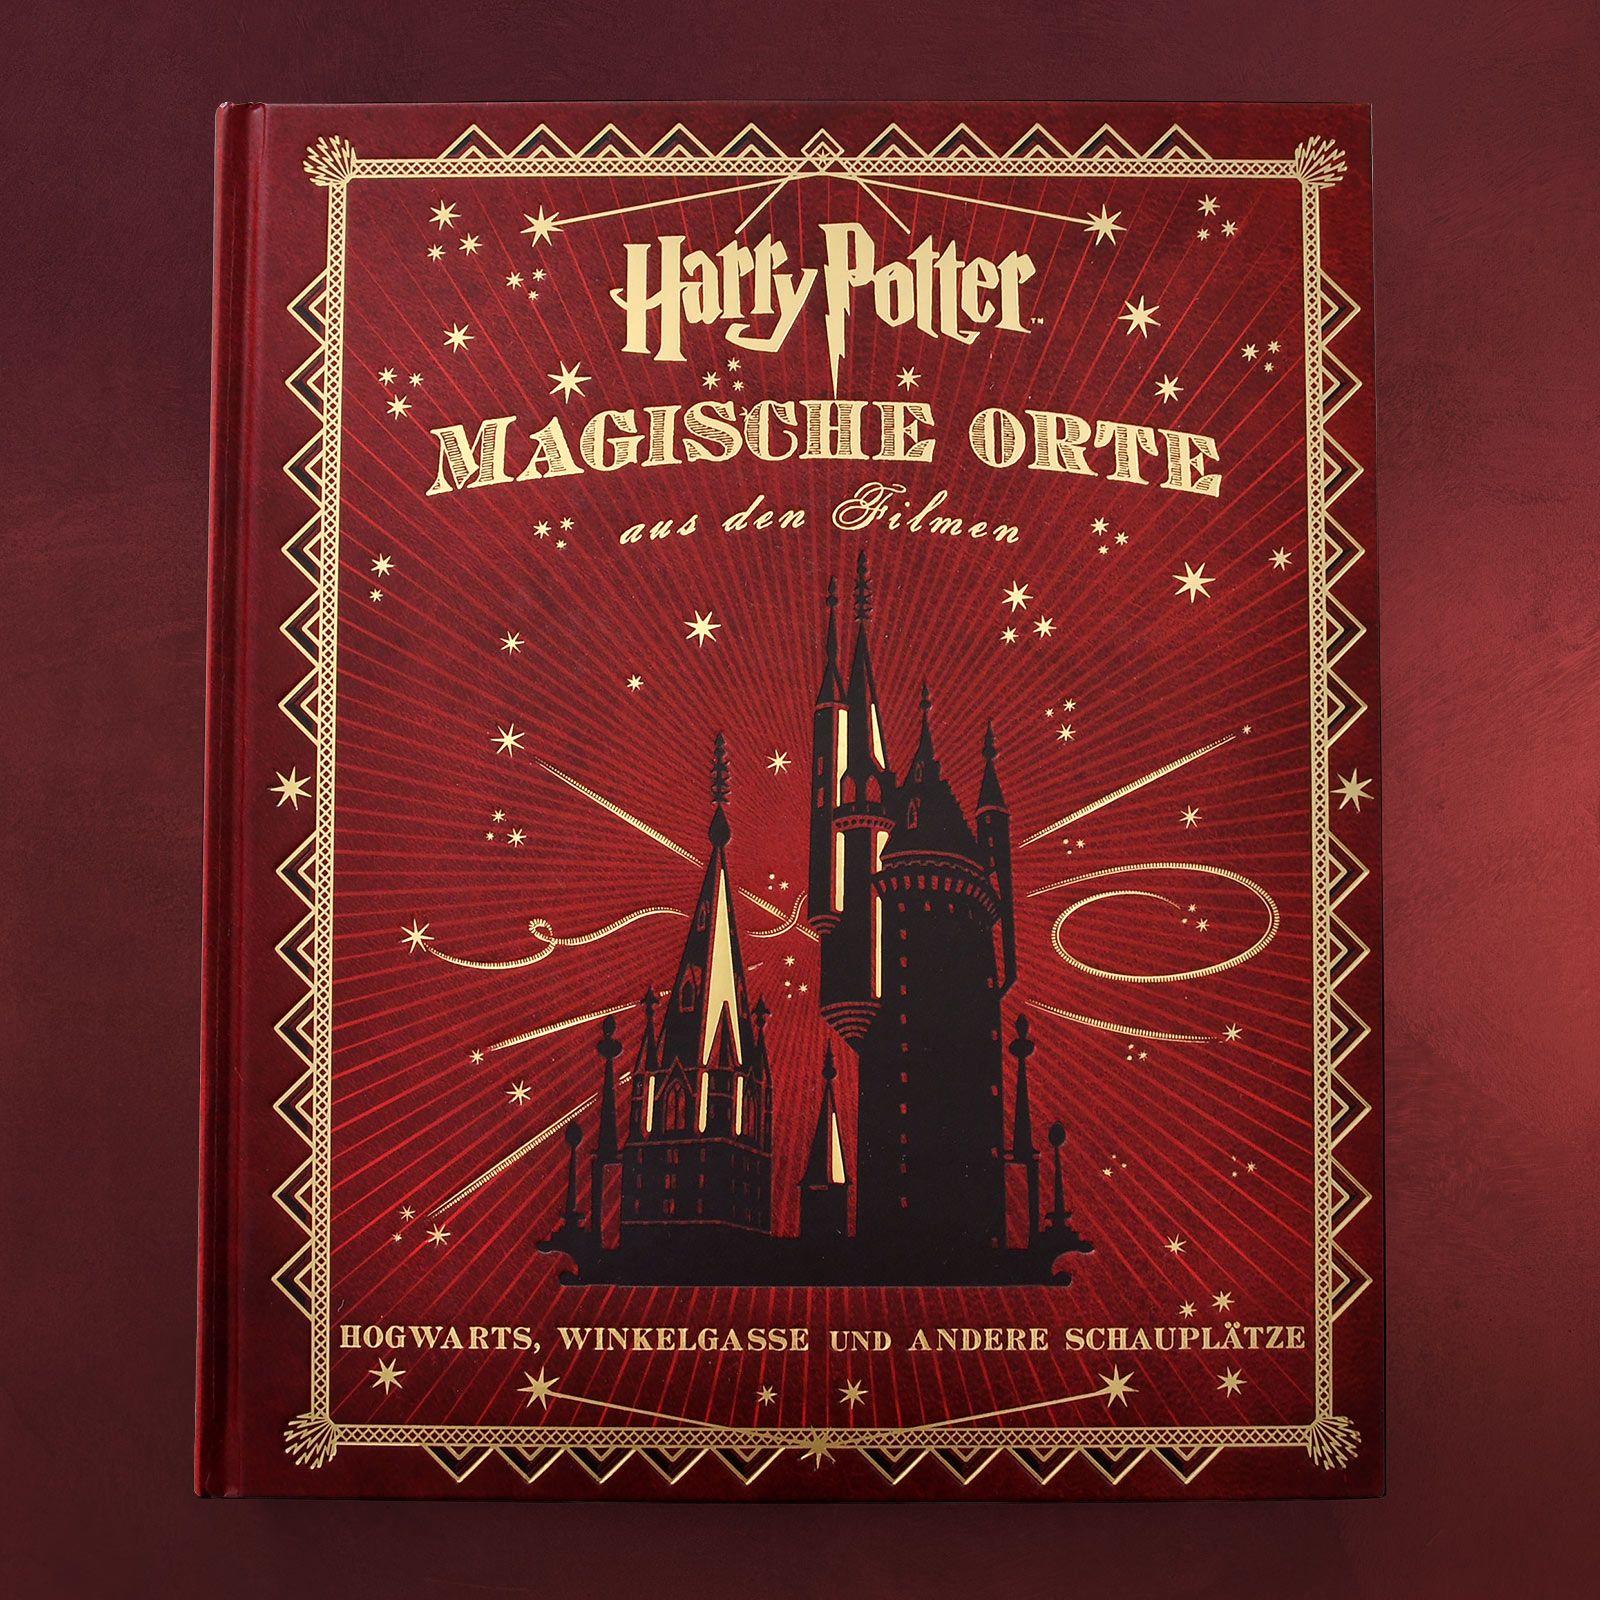 Harry Potter Magische Orte Hogwarts Diagon Alley Hardcover Book